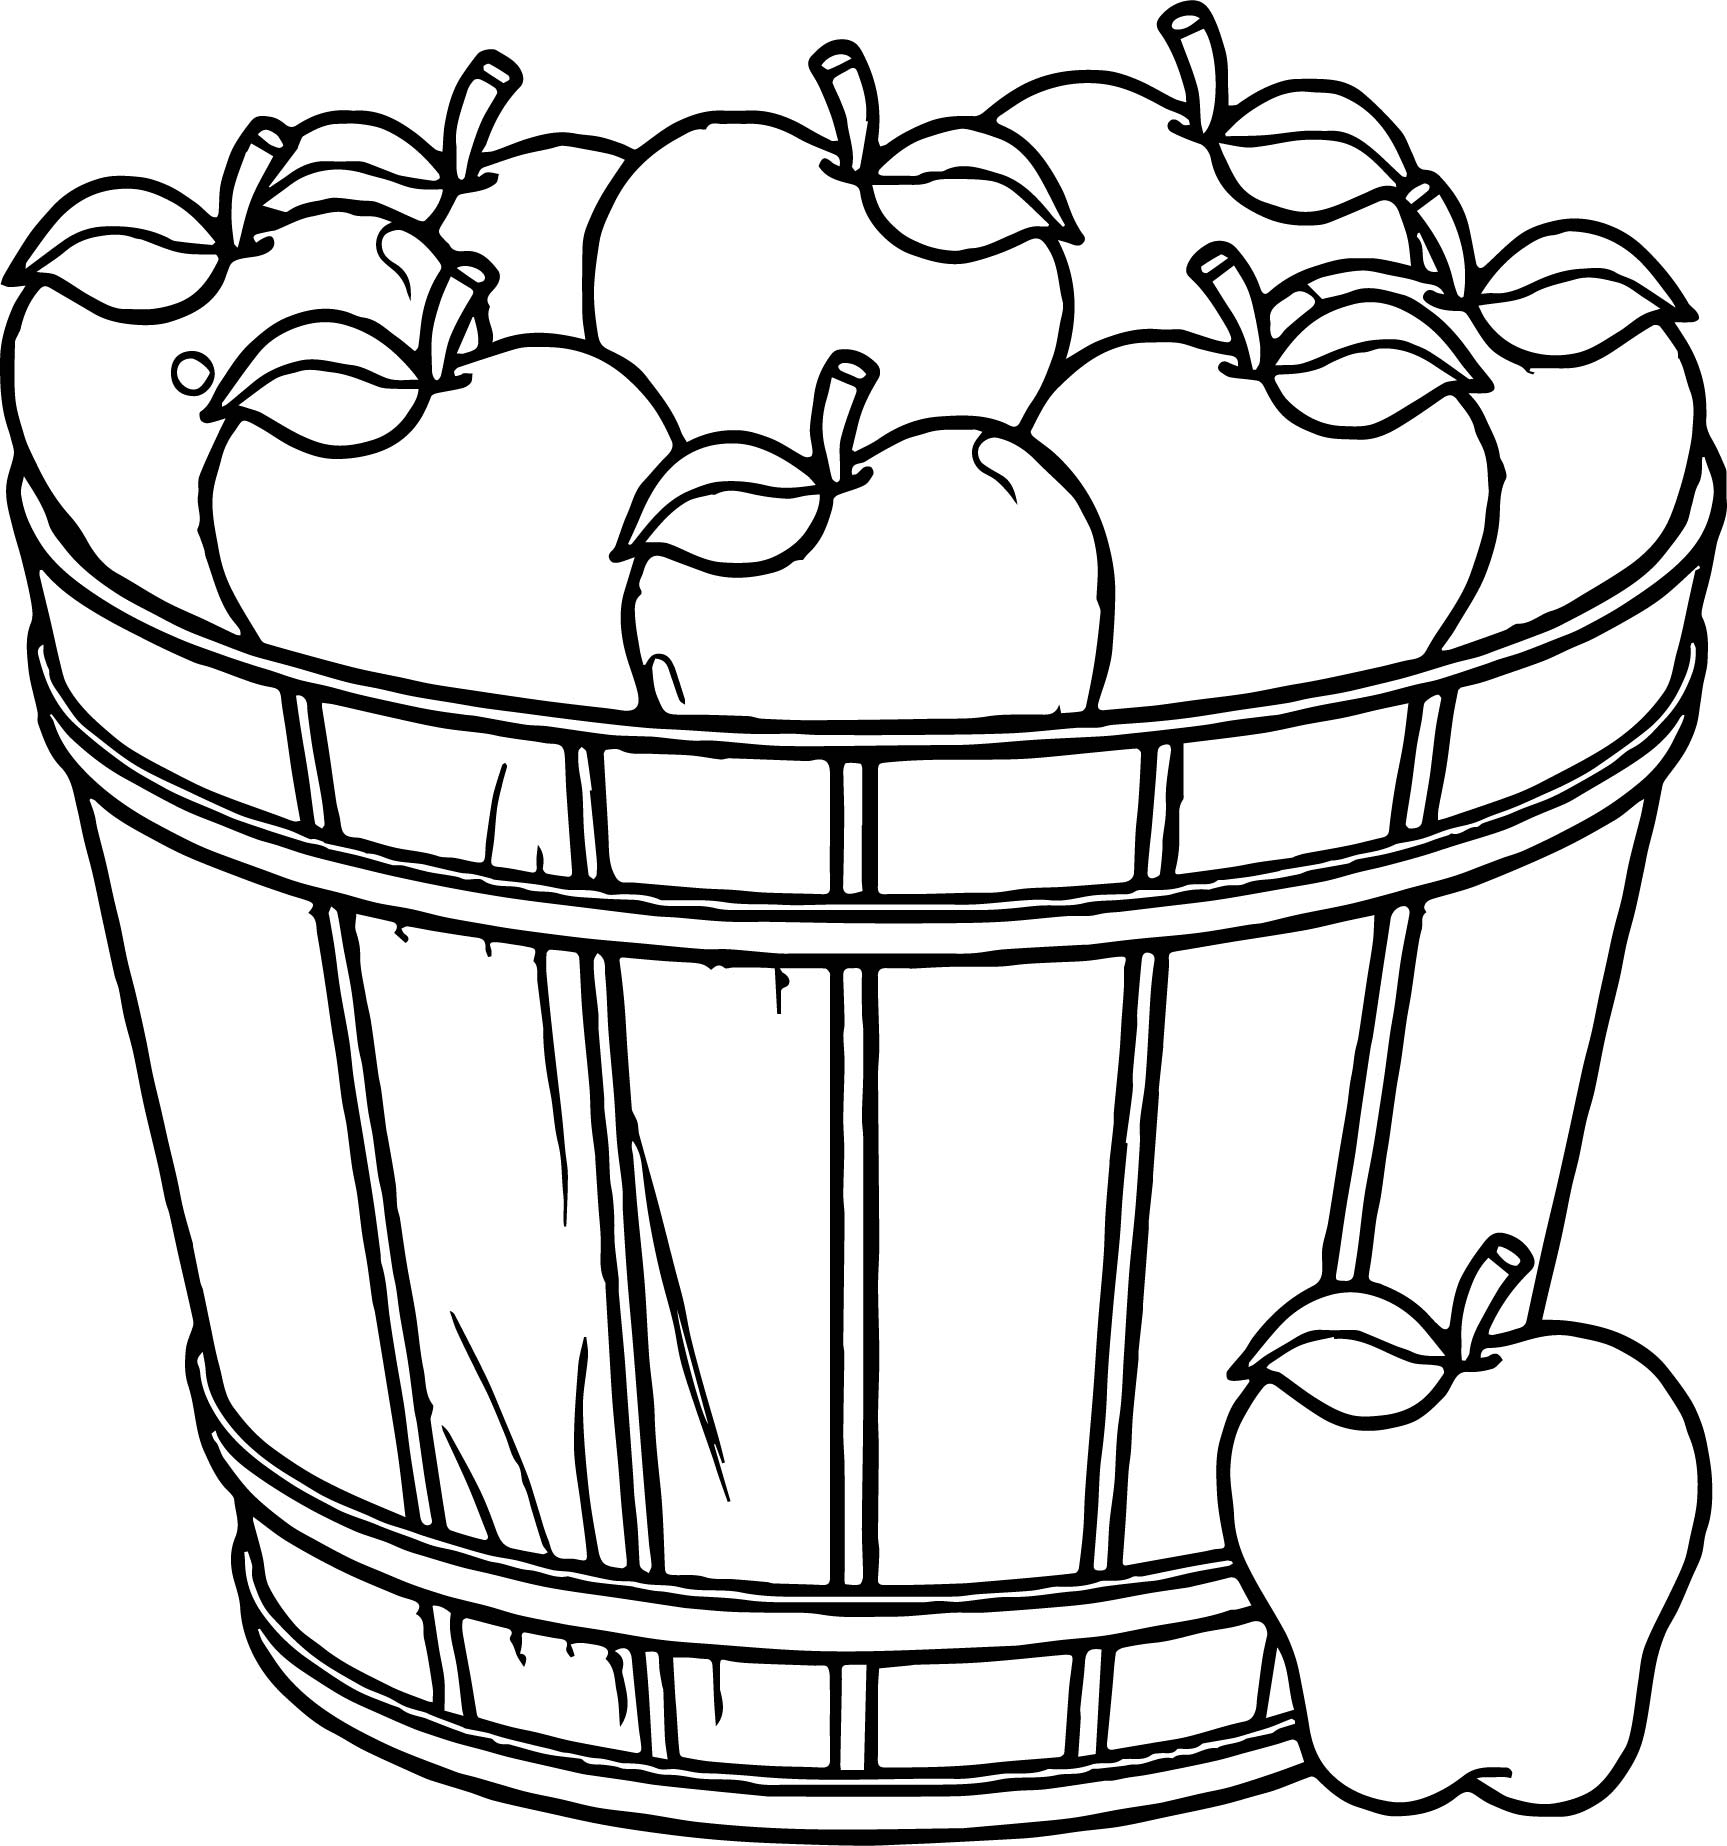 Fruit Bowl Drawing At Getdrawings